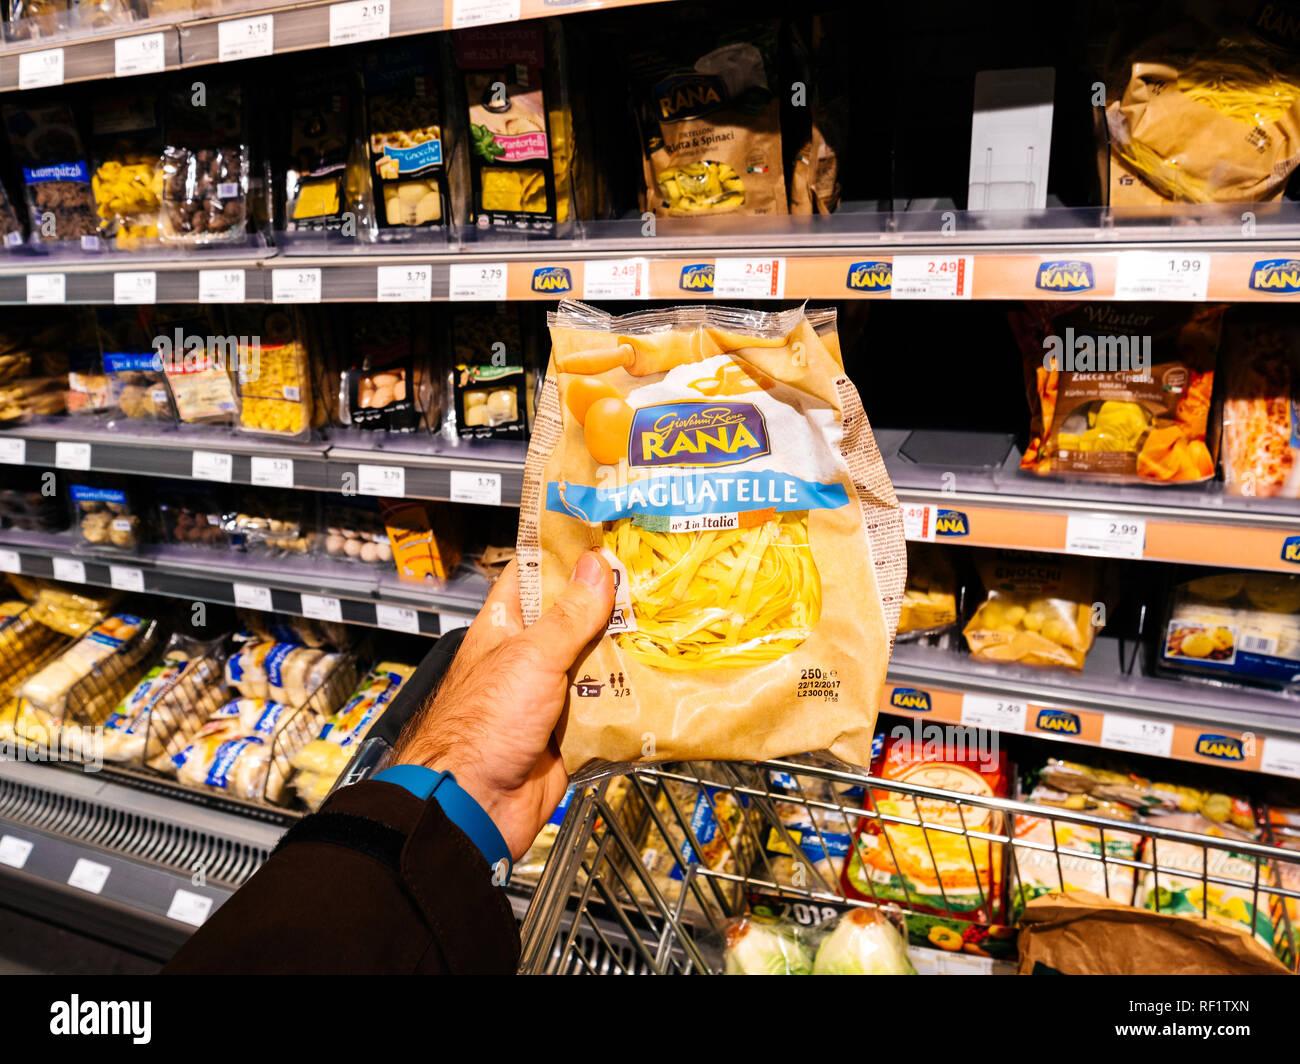 Bomann Kühlschrank Edeka : Fresh pasta shop stockfotos & fresh pasta shop bilder alamy